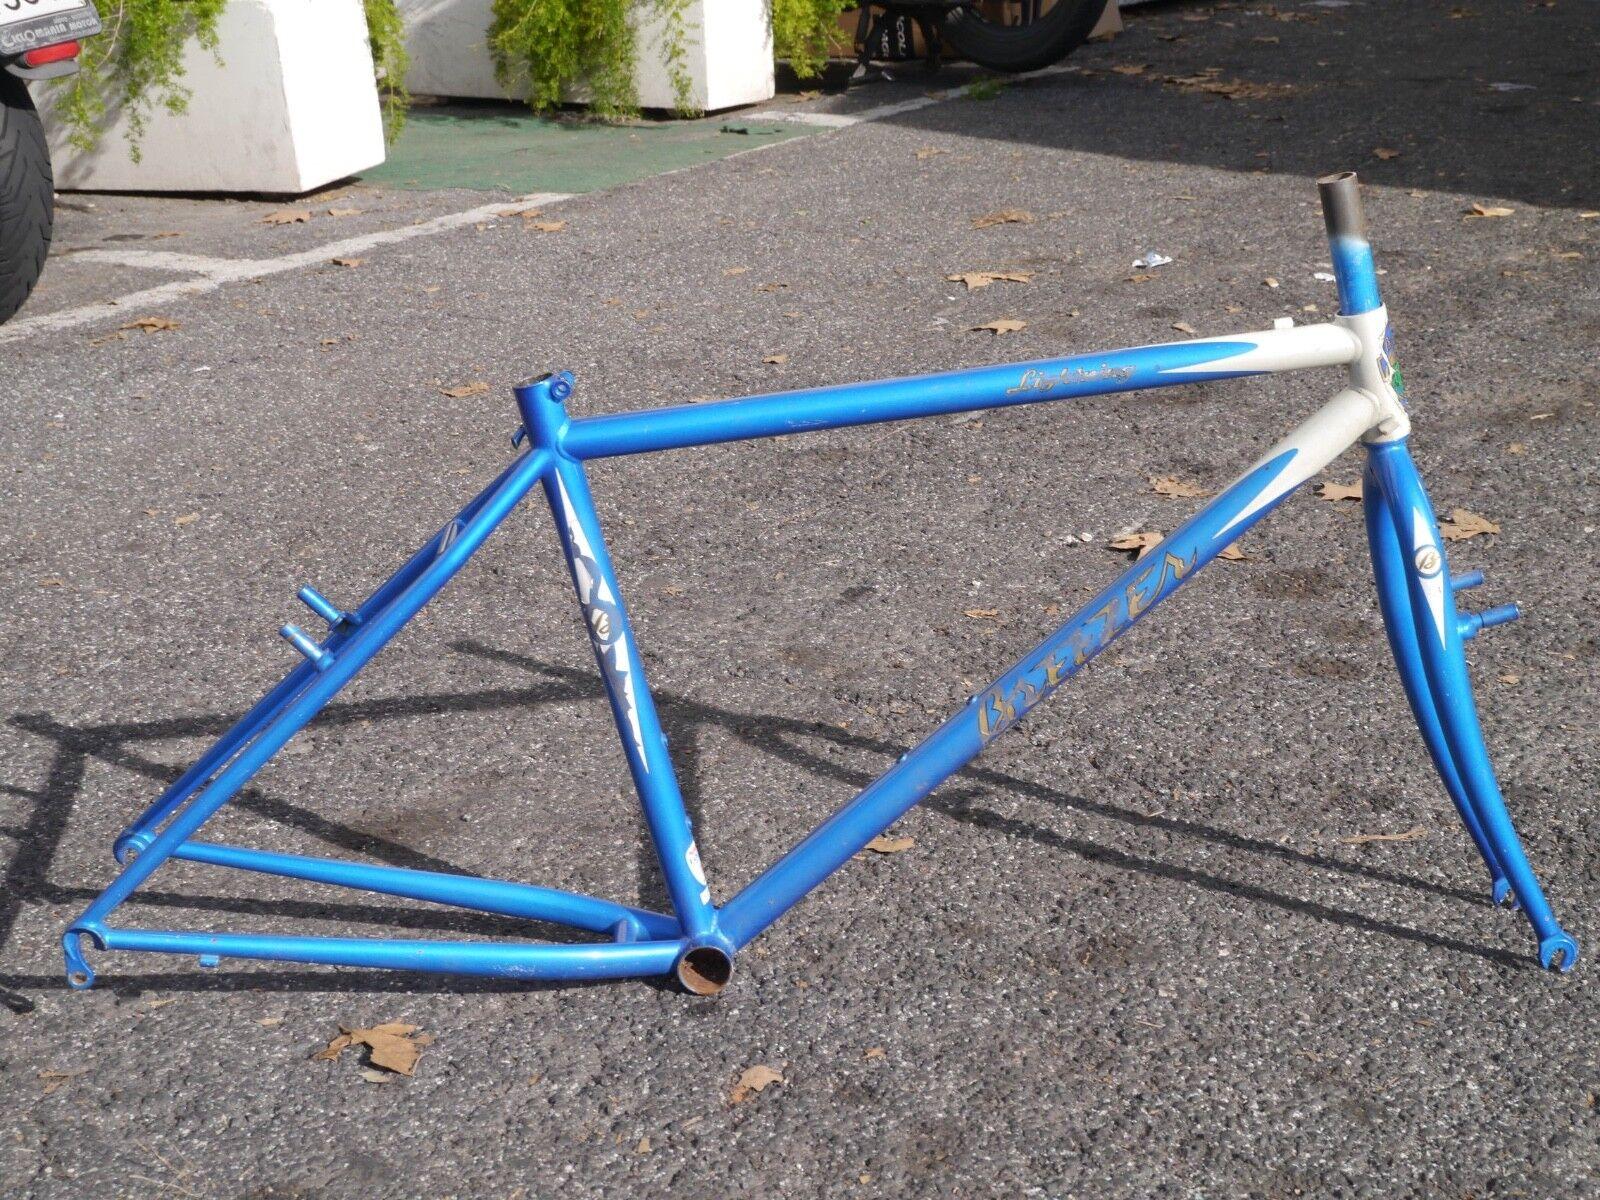 NOS Breezer Lighting vintage mountain bike frame, 17 , steel made, RETRO MTB